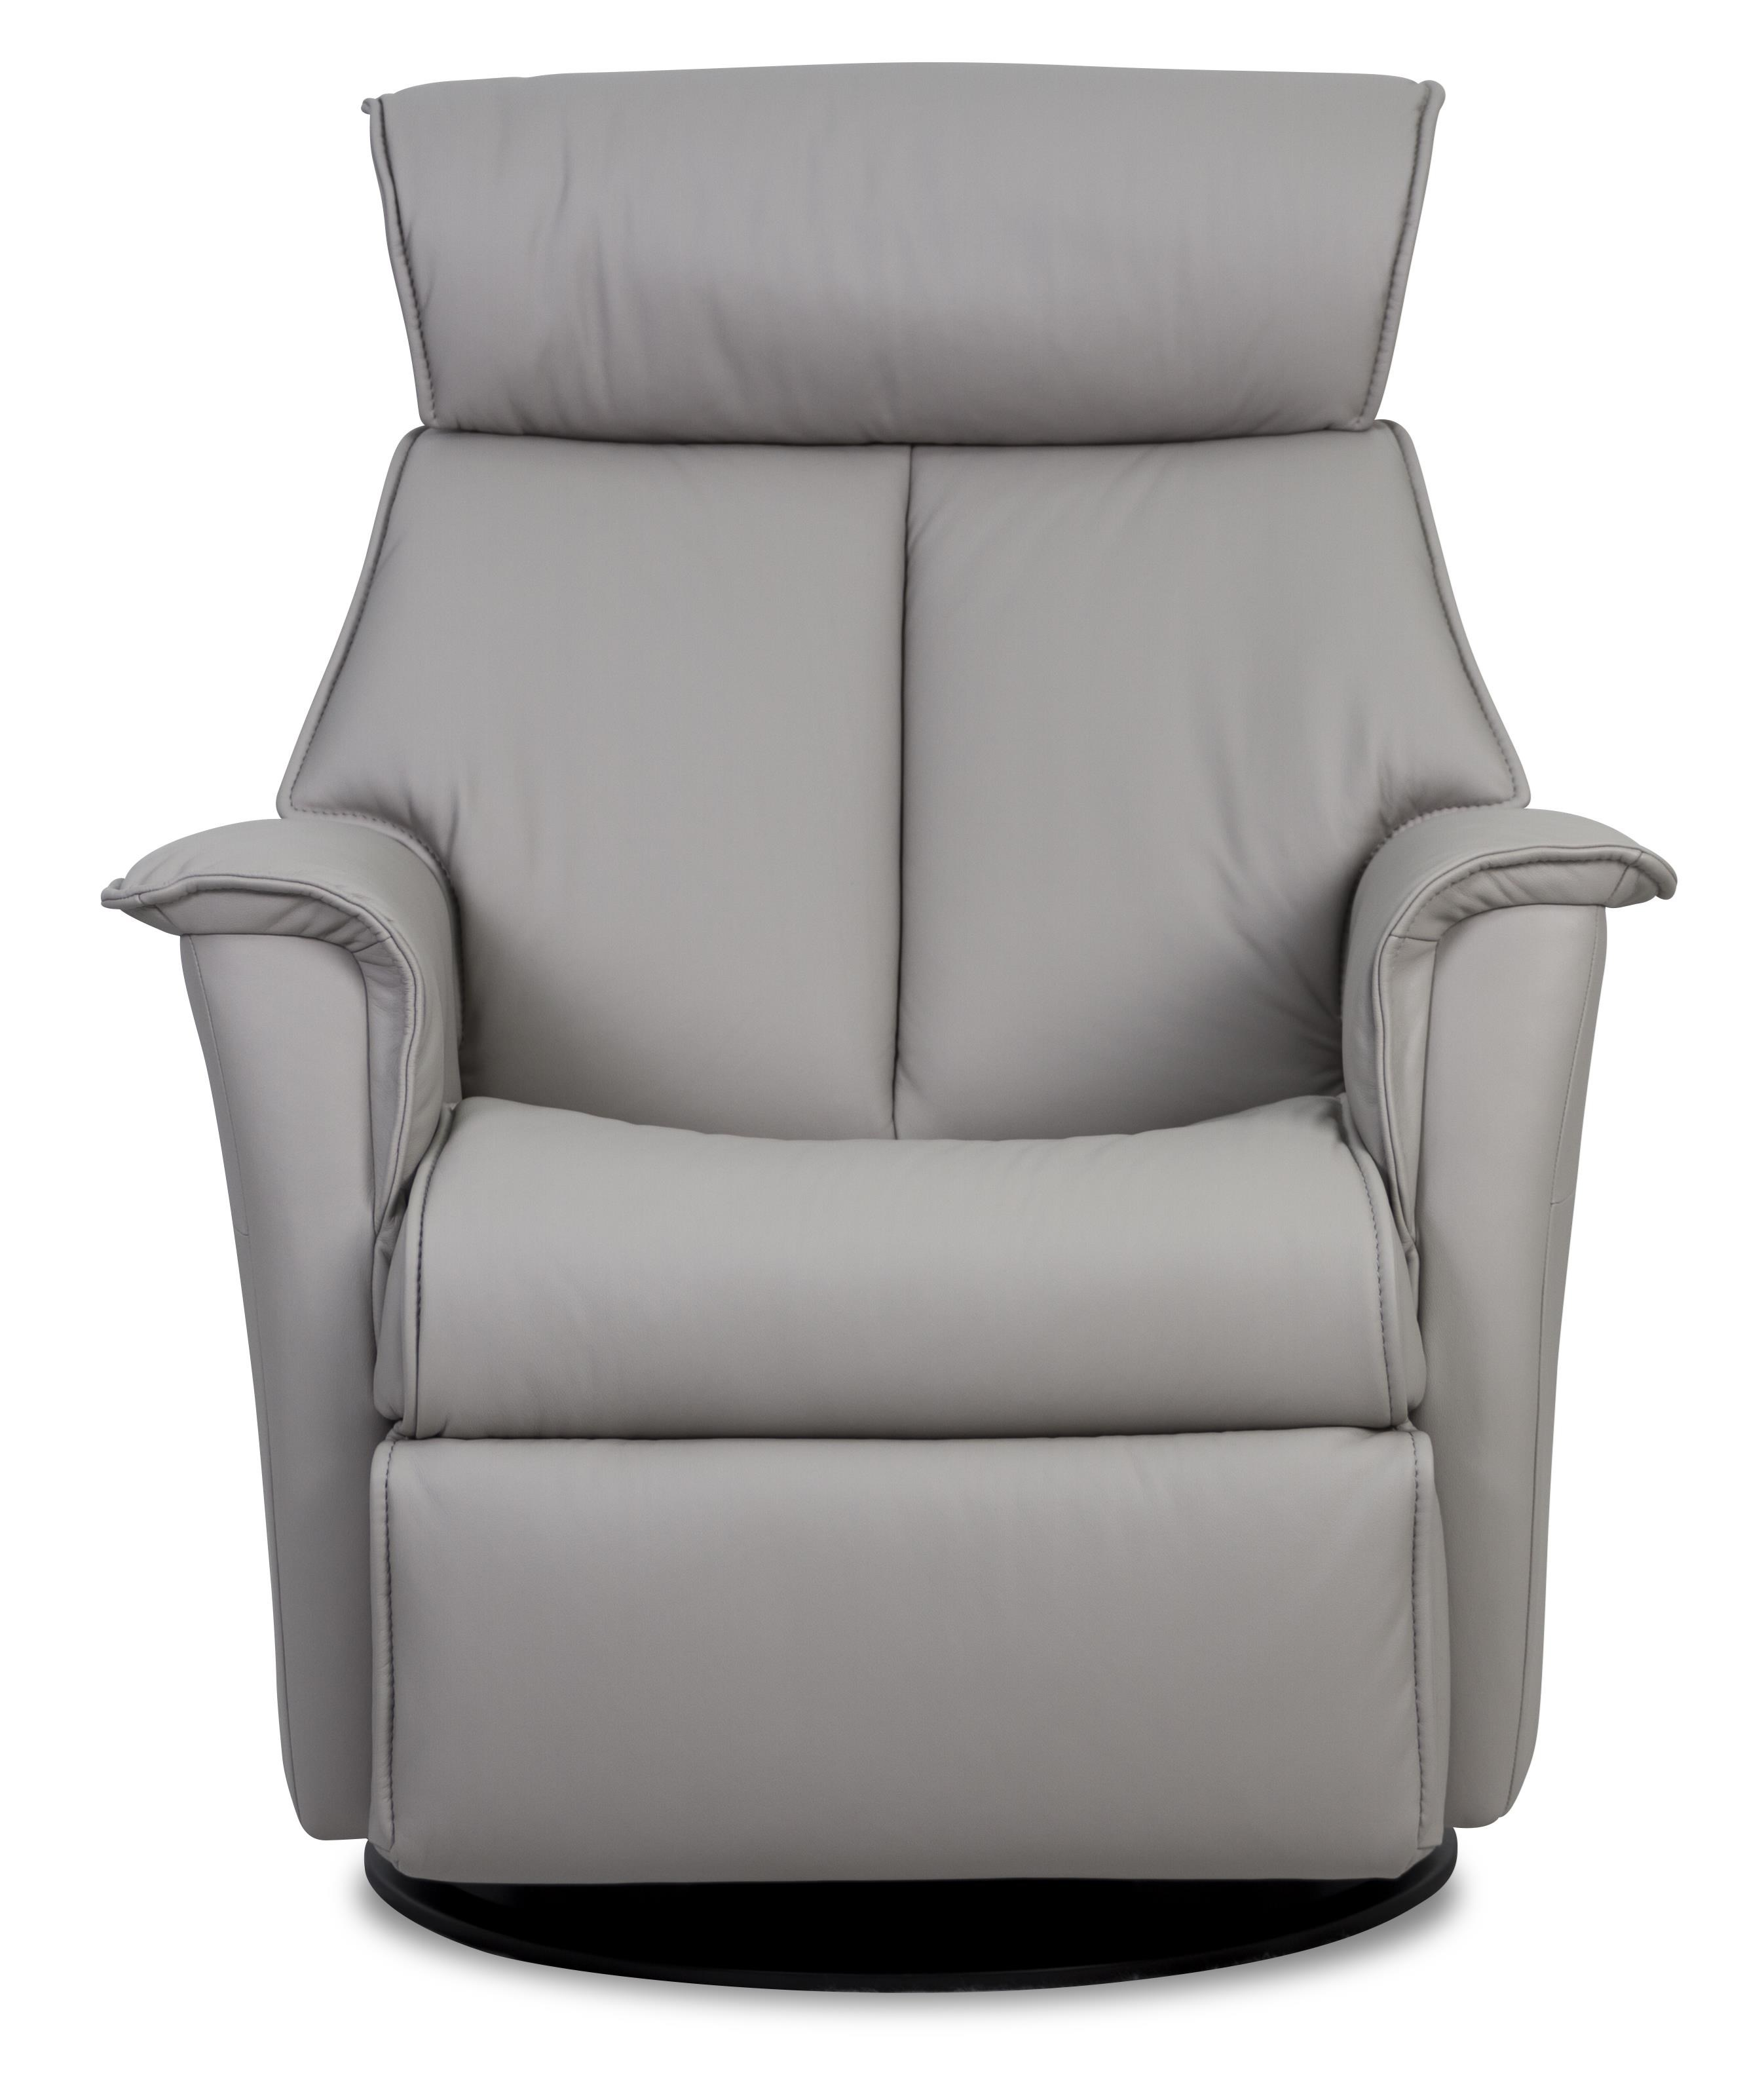 sofas hamilton ontario eq3 reverie sofa leather reclining made in canada brokeasshome